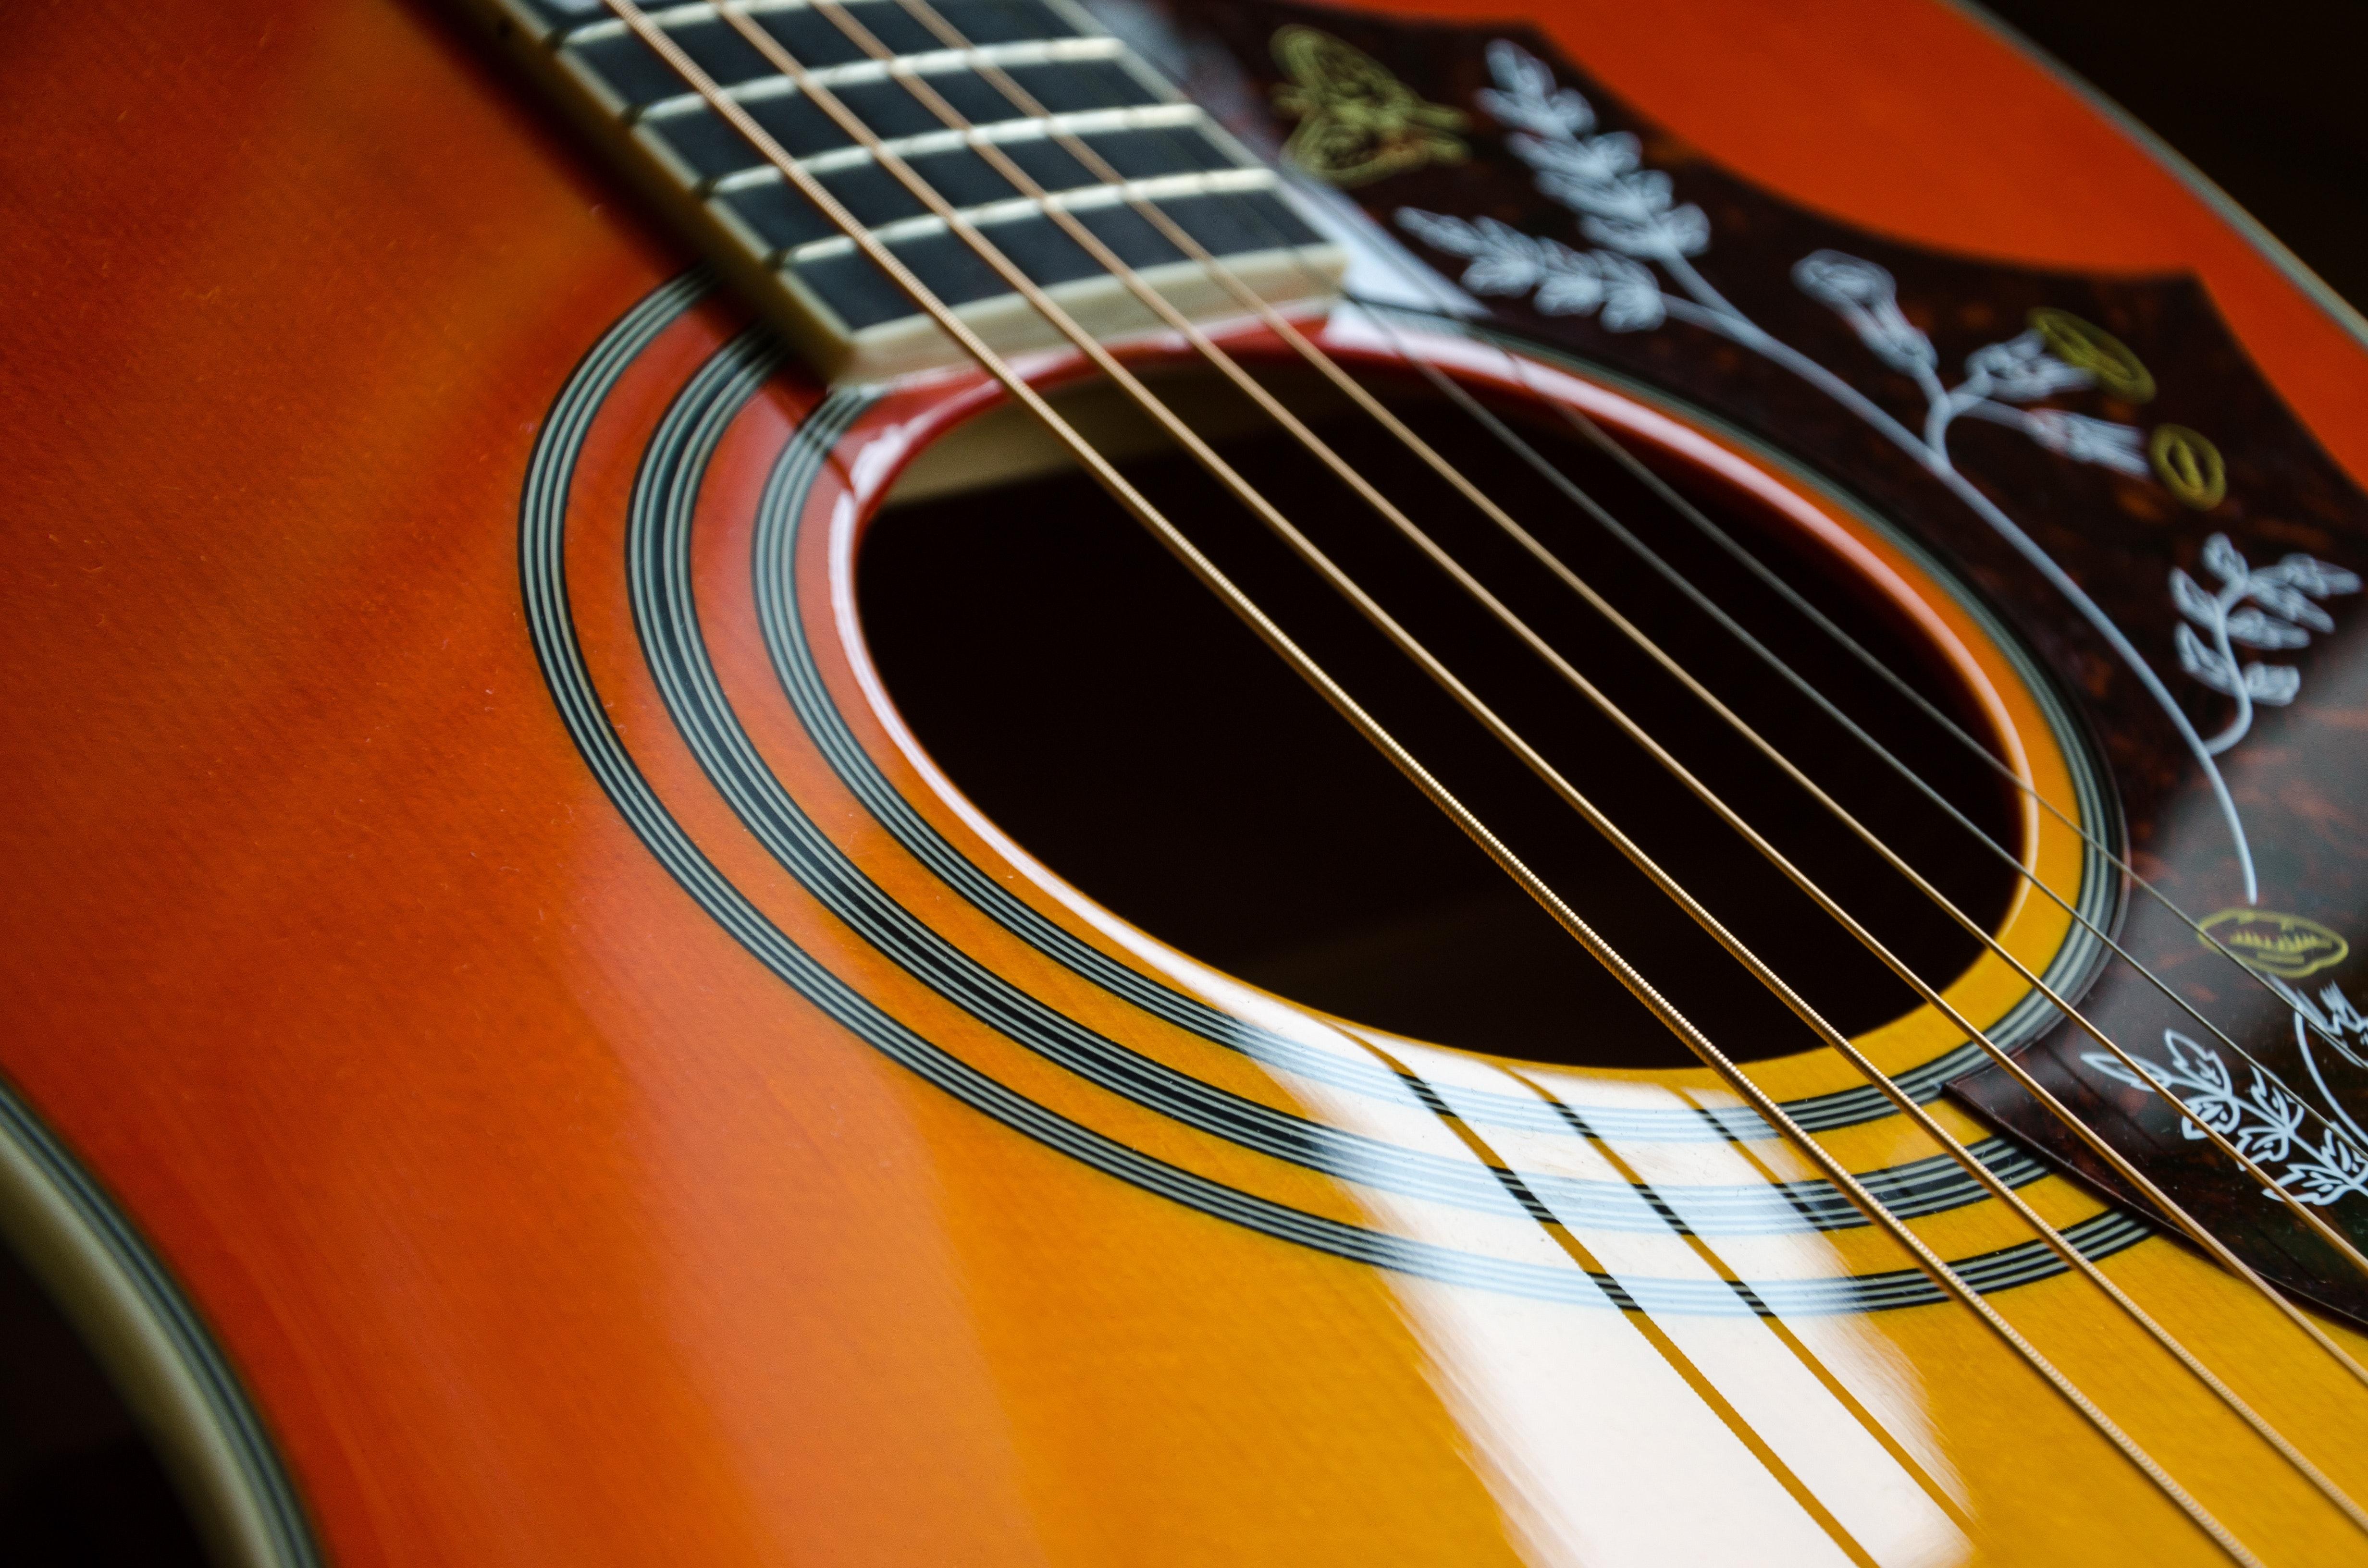 Brown And Black Leaf Print Guitar Free Stock Photo